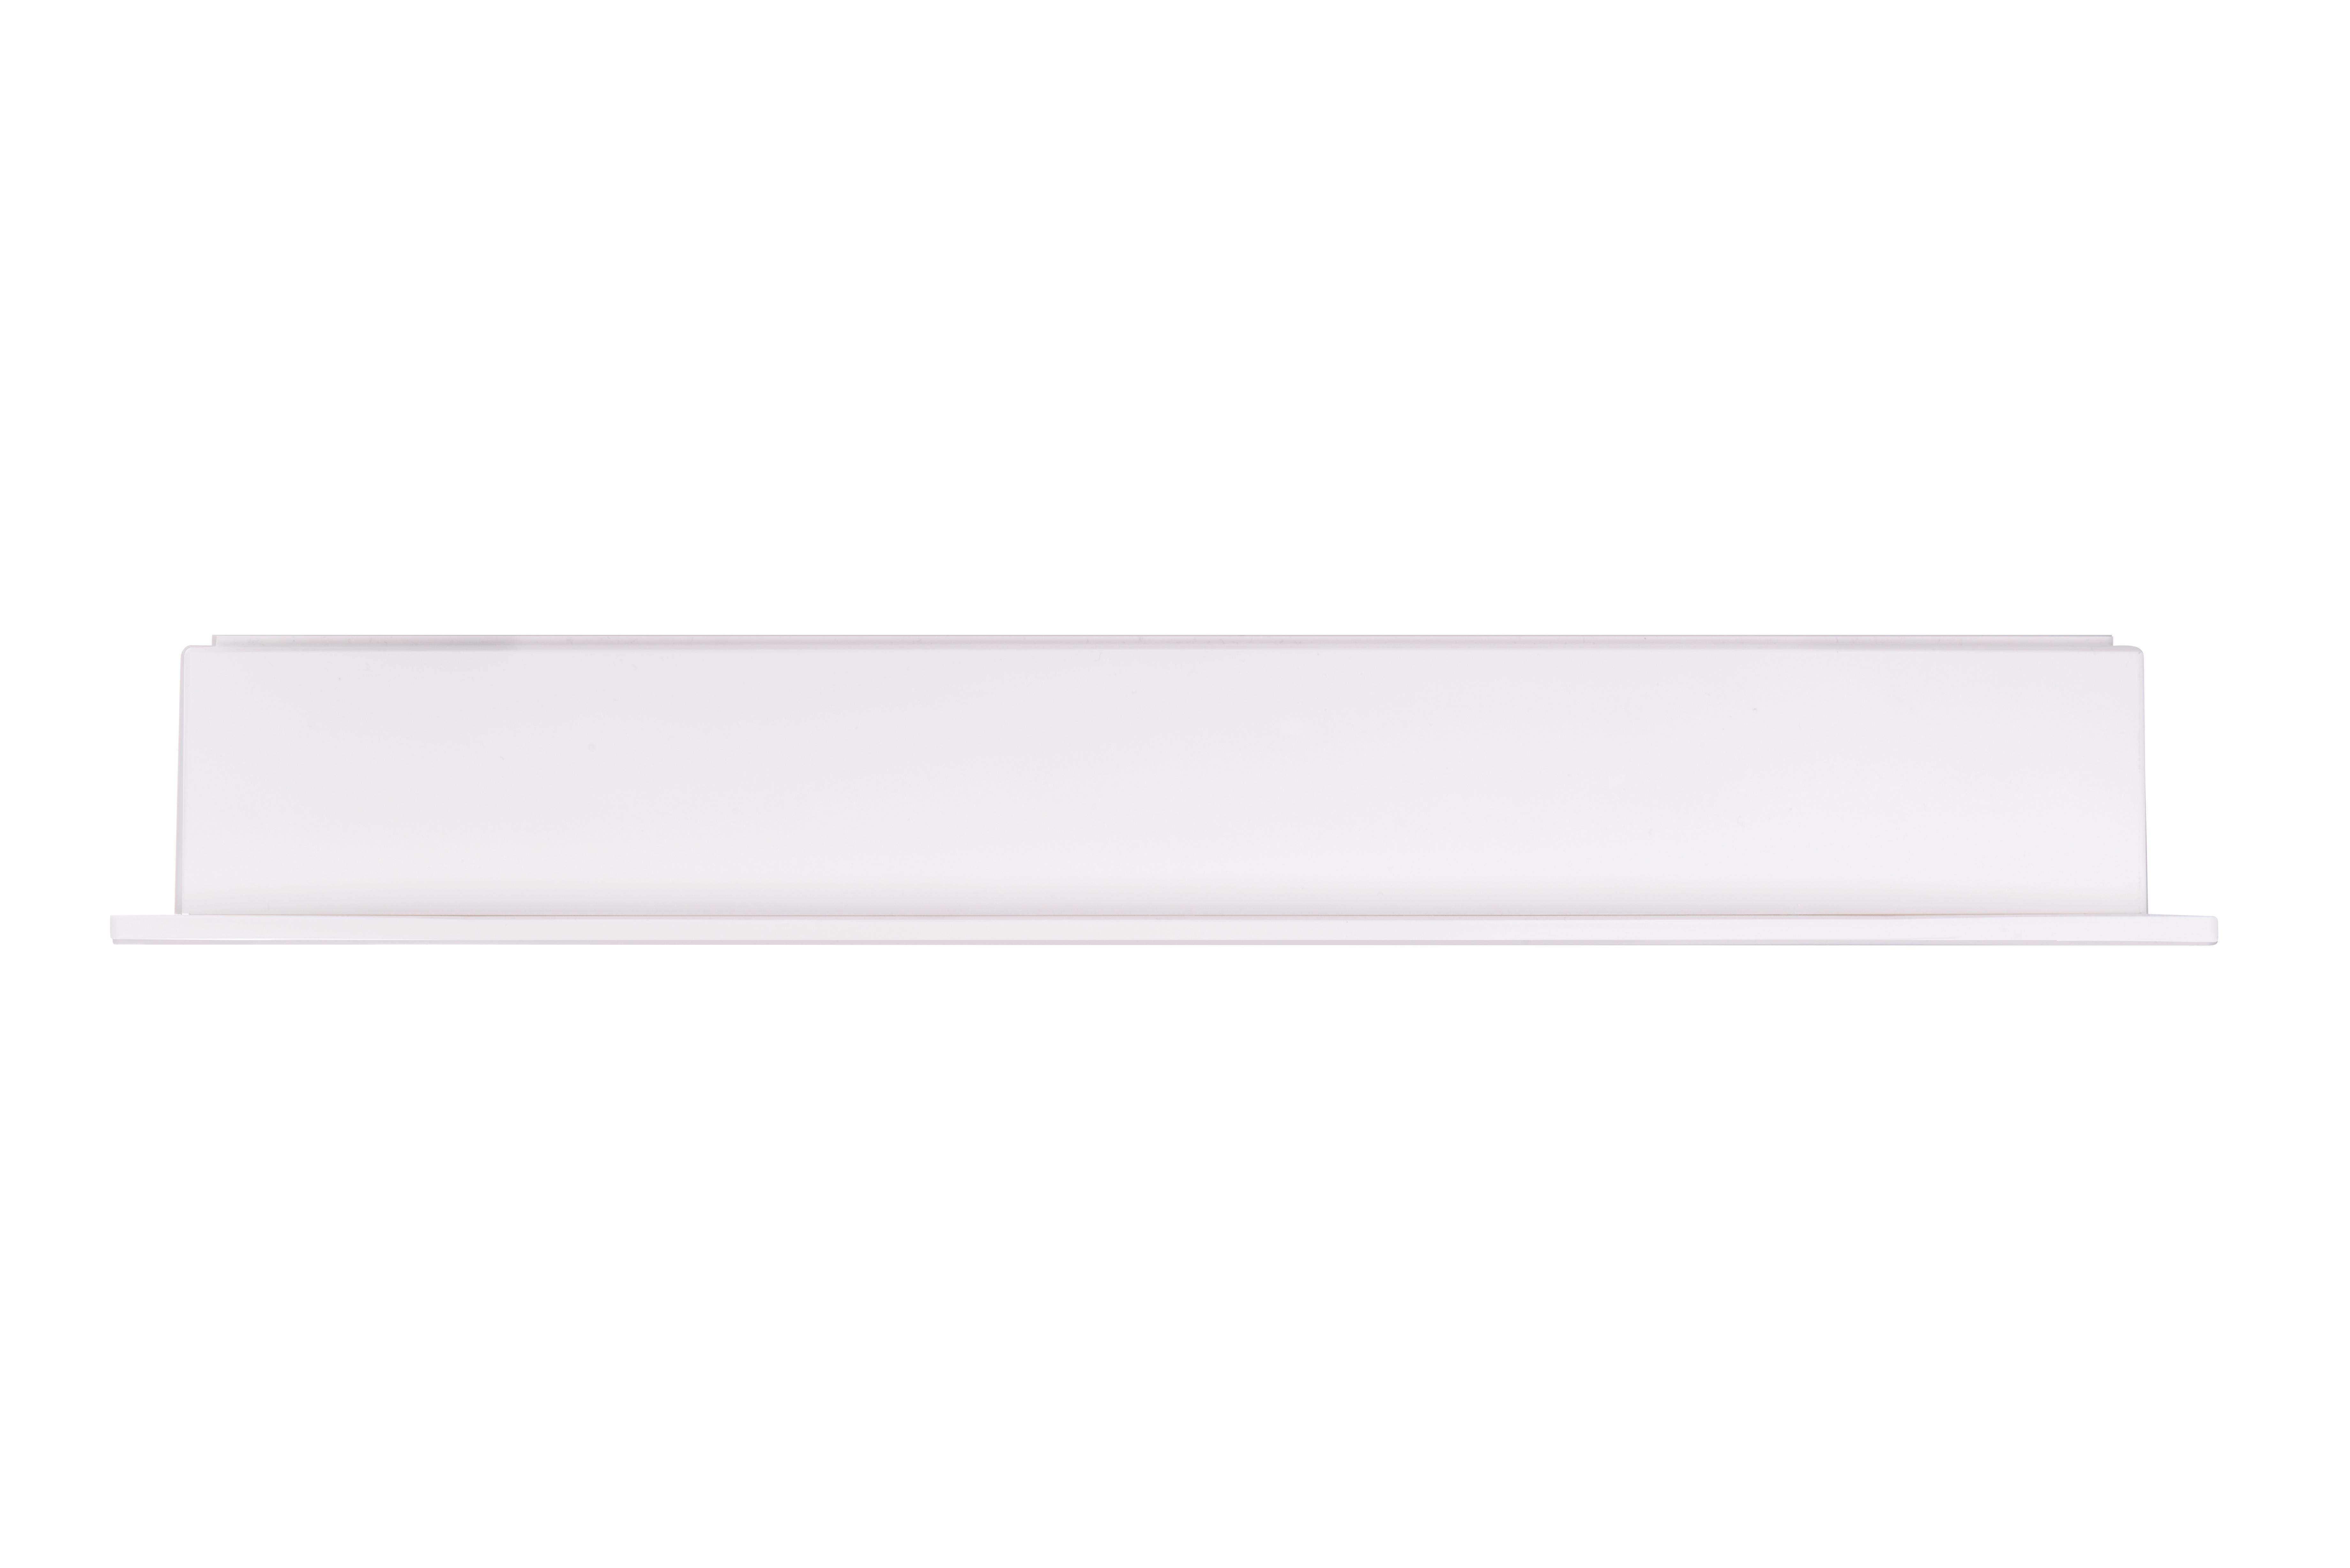 Lampa antipanica led Intelight 94752   3h mentinut test automat 4